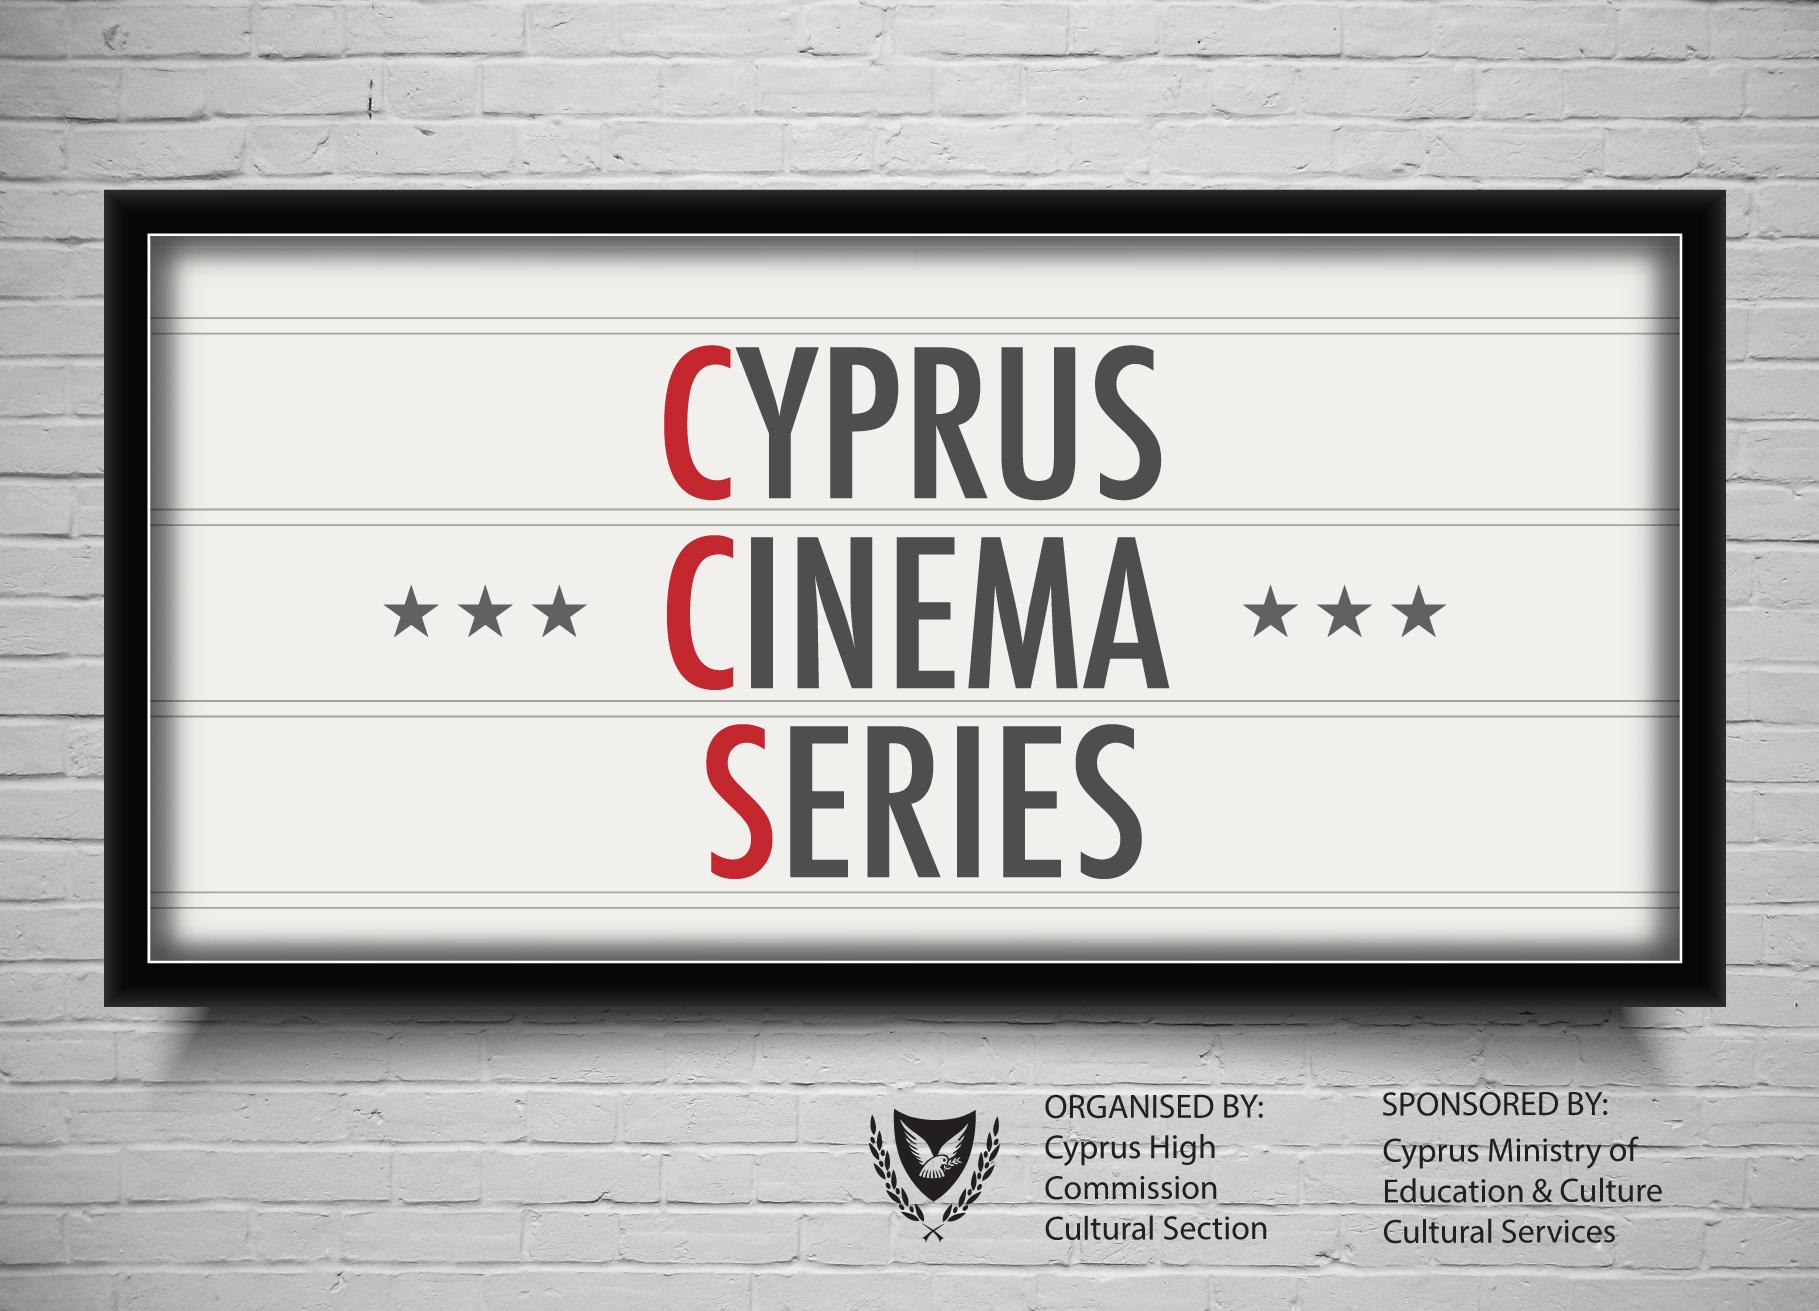 Cyprus Film Series